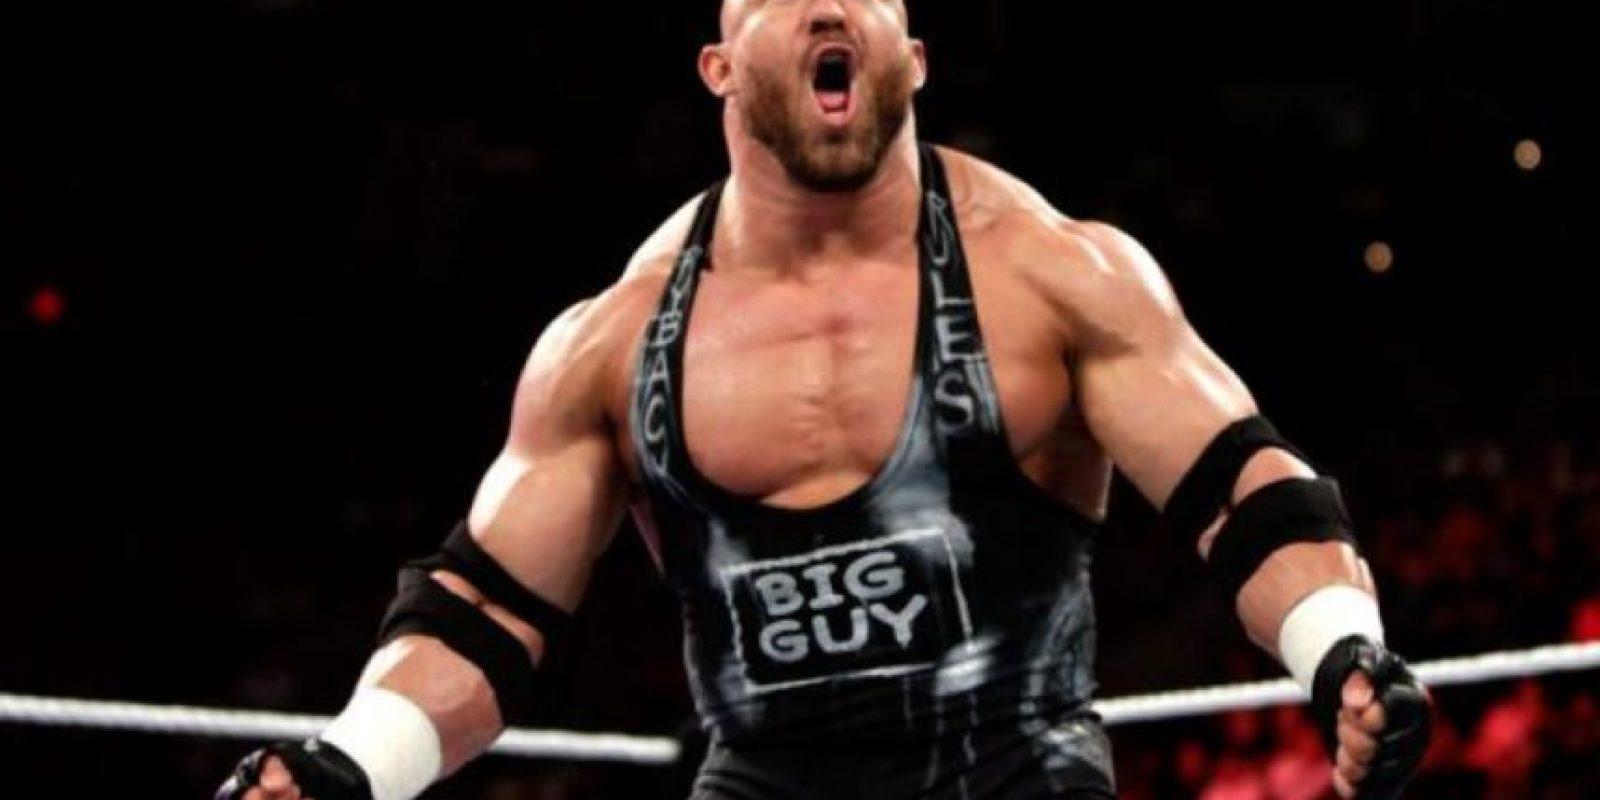 Es un luchador estadounidense de 34 aós Foto:WWE